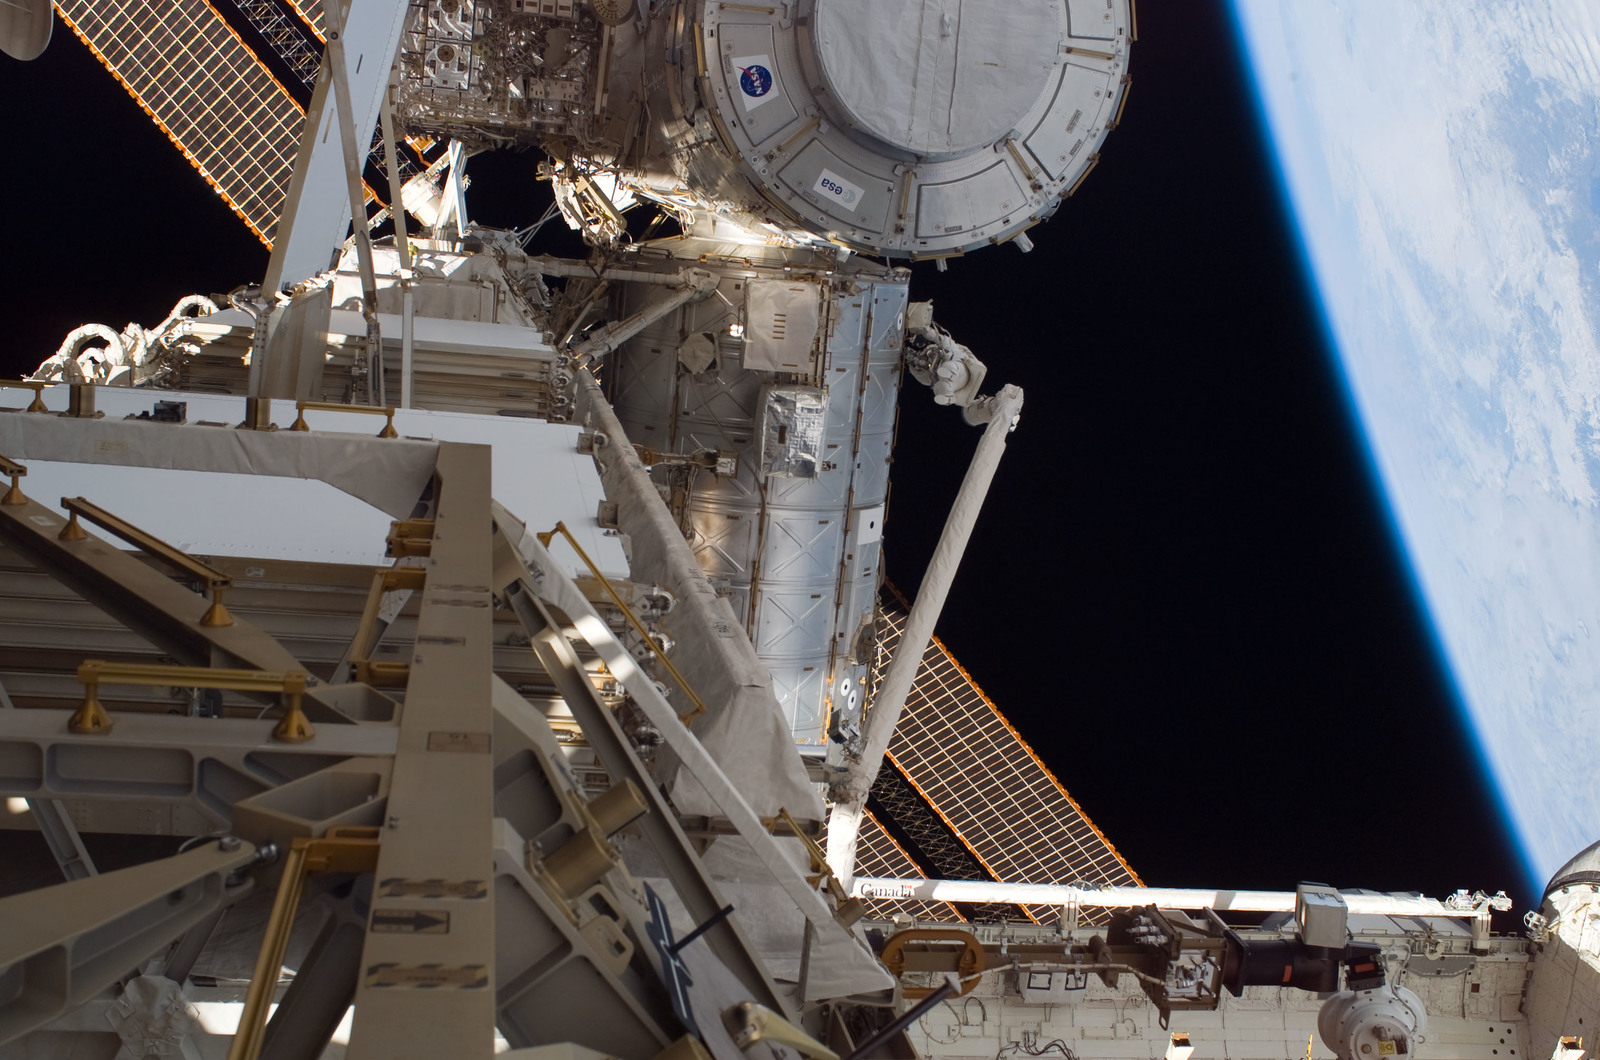 S120E008278 - STS-120 - EVA3 - Node 2 and Destiny laboratory module